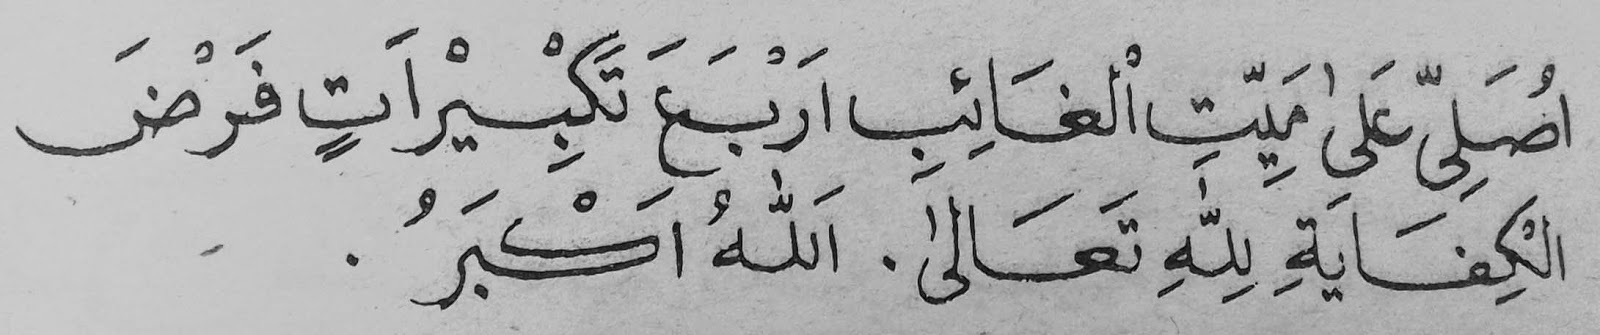 Niat Sholat Ghaib Dan Artinya